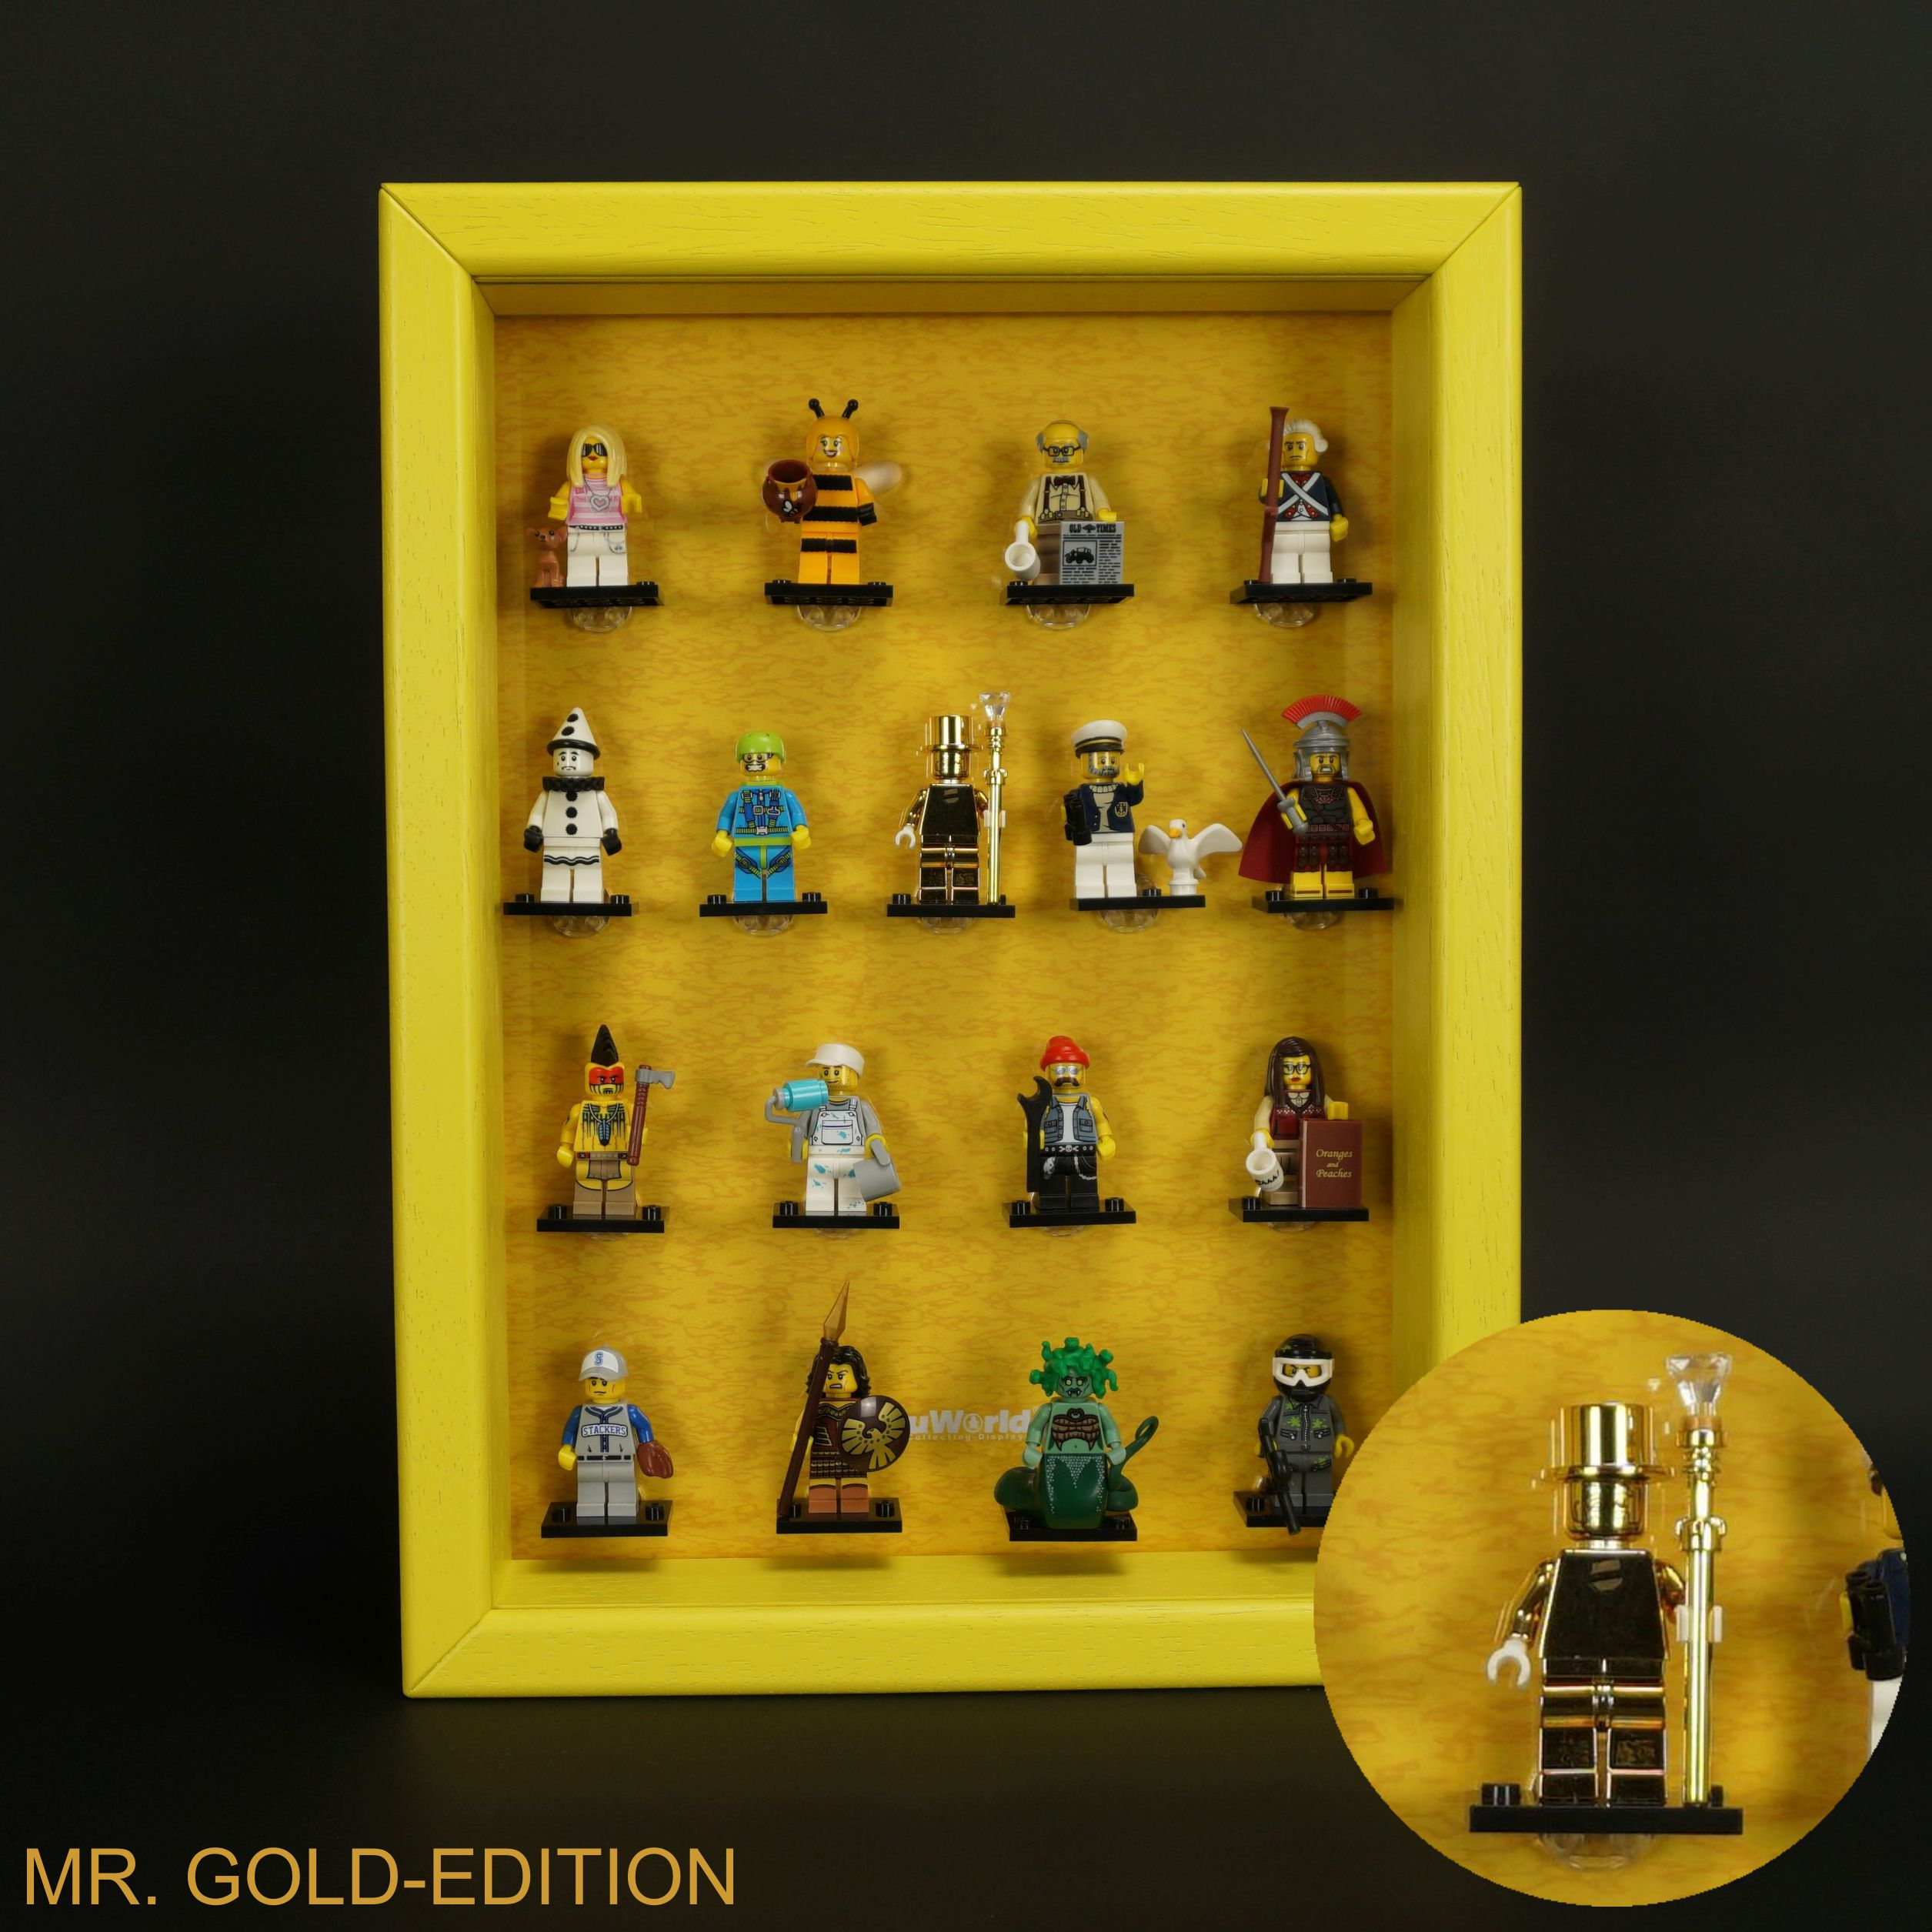 Aluminum Display Case For Lego Figurines Without Return Merchandise & Memorabilia Rocks, Fossils & Minerals